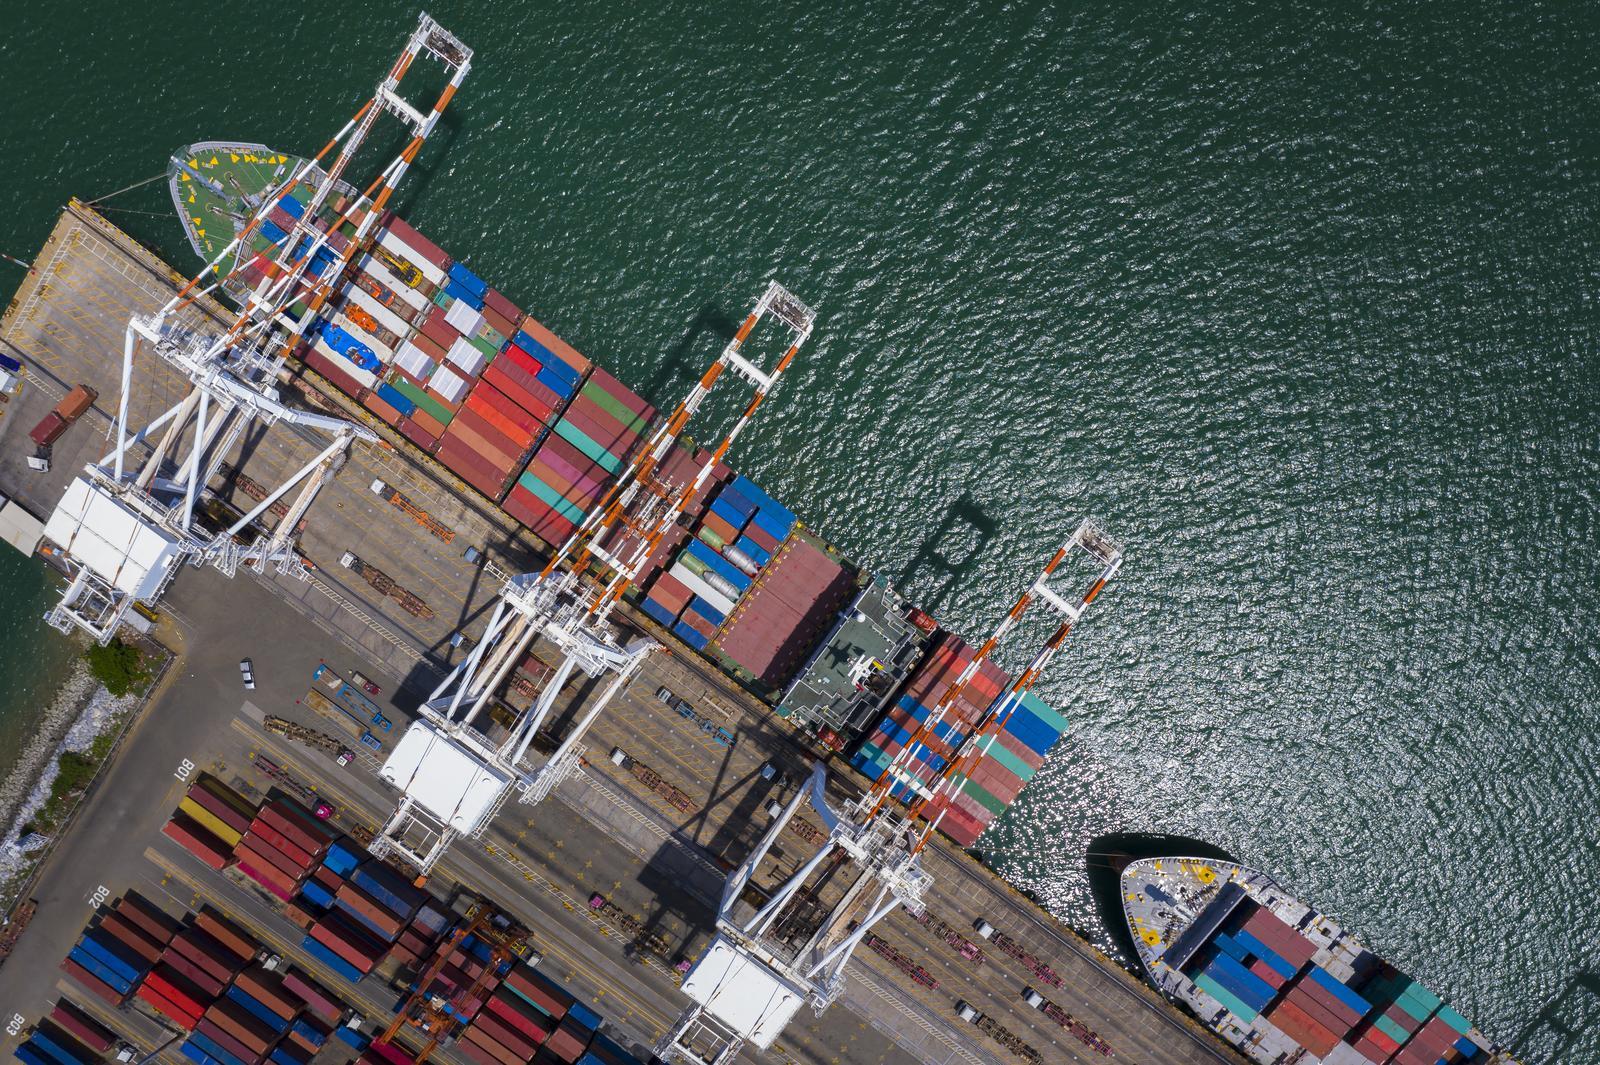 Port and waterway operation services in Kuressaare